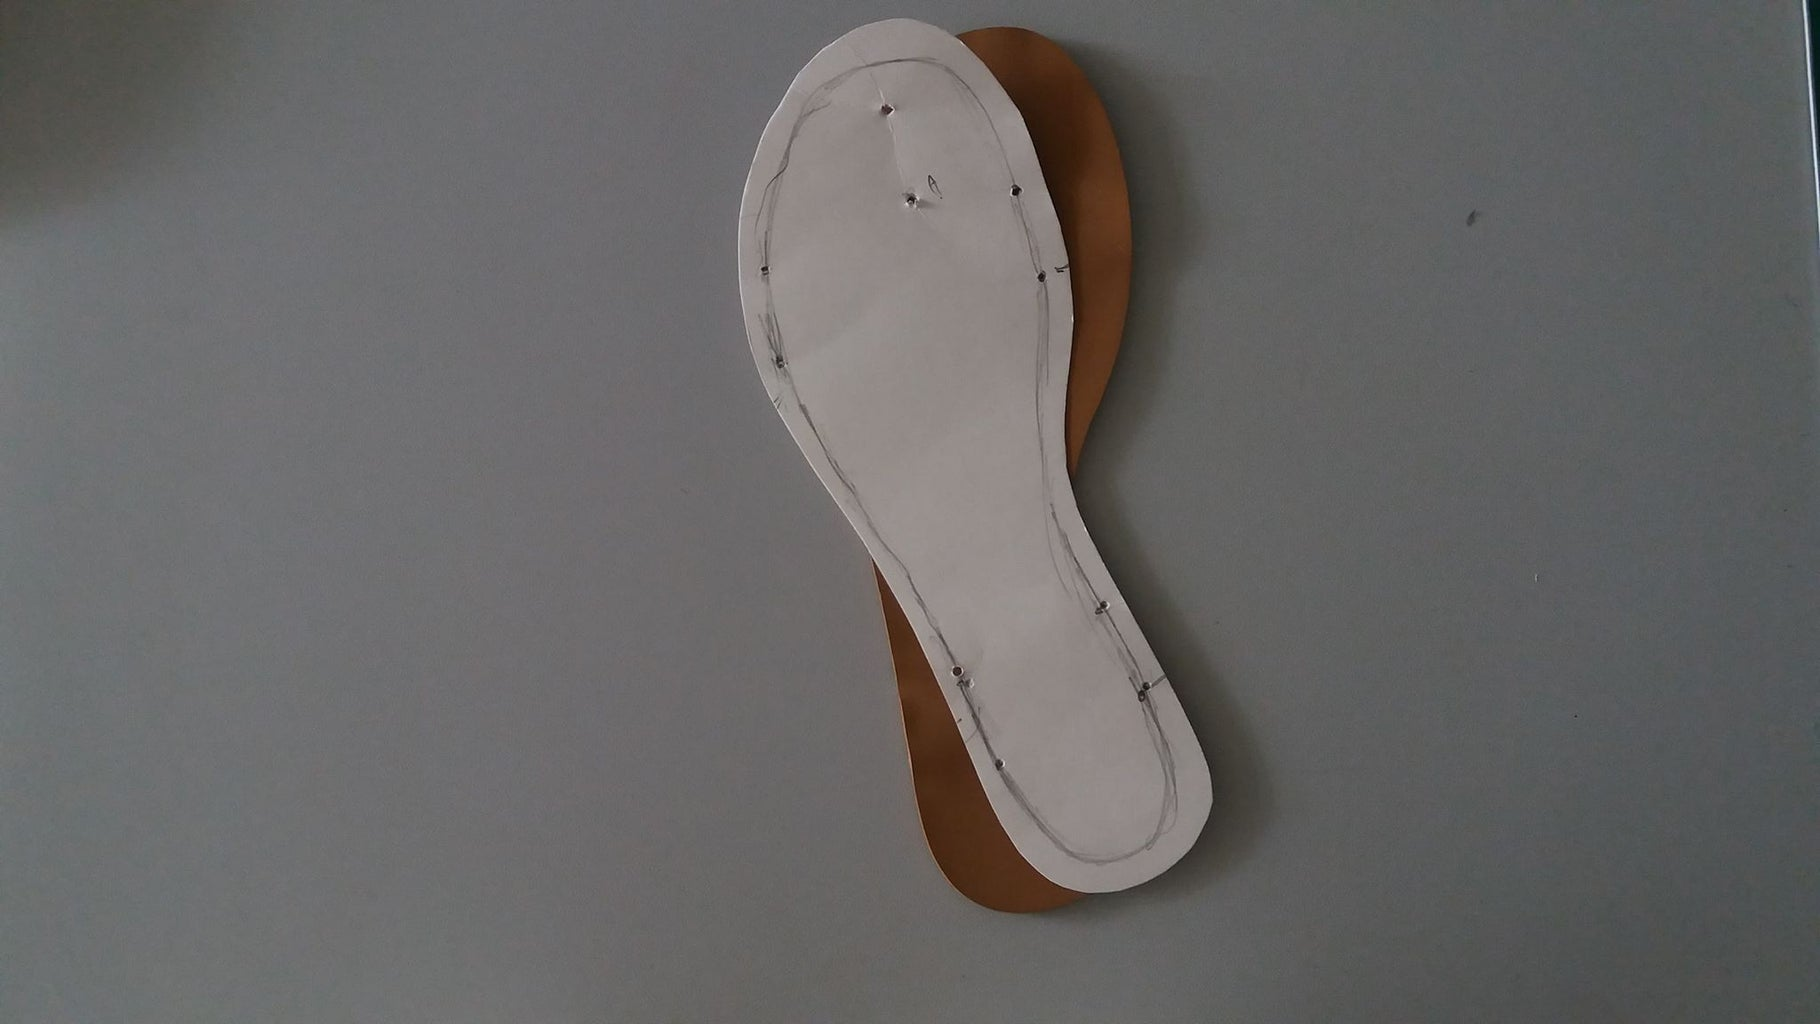 Step 2: Making the Shoe Plantilla